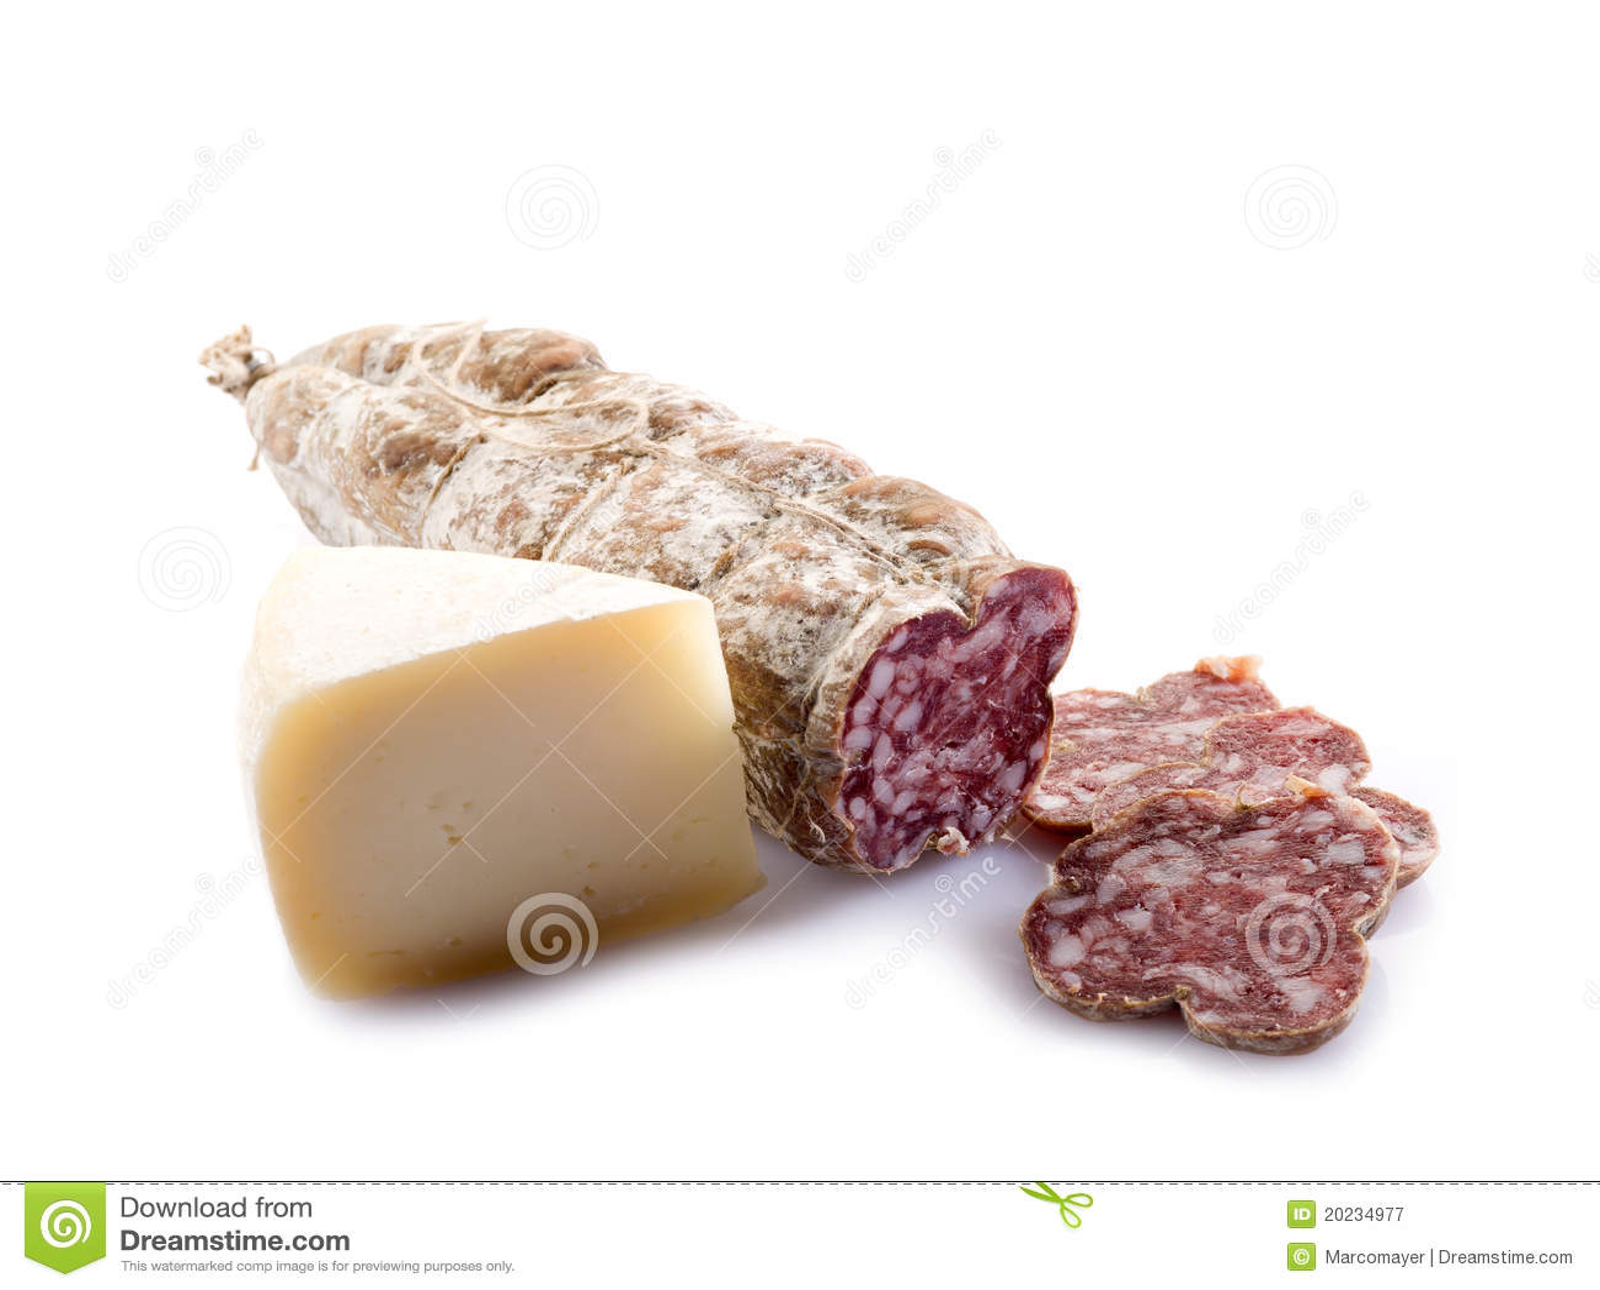 Italian salami and cheese